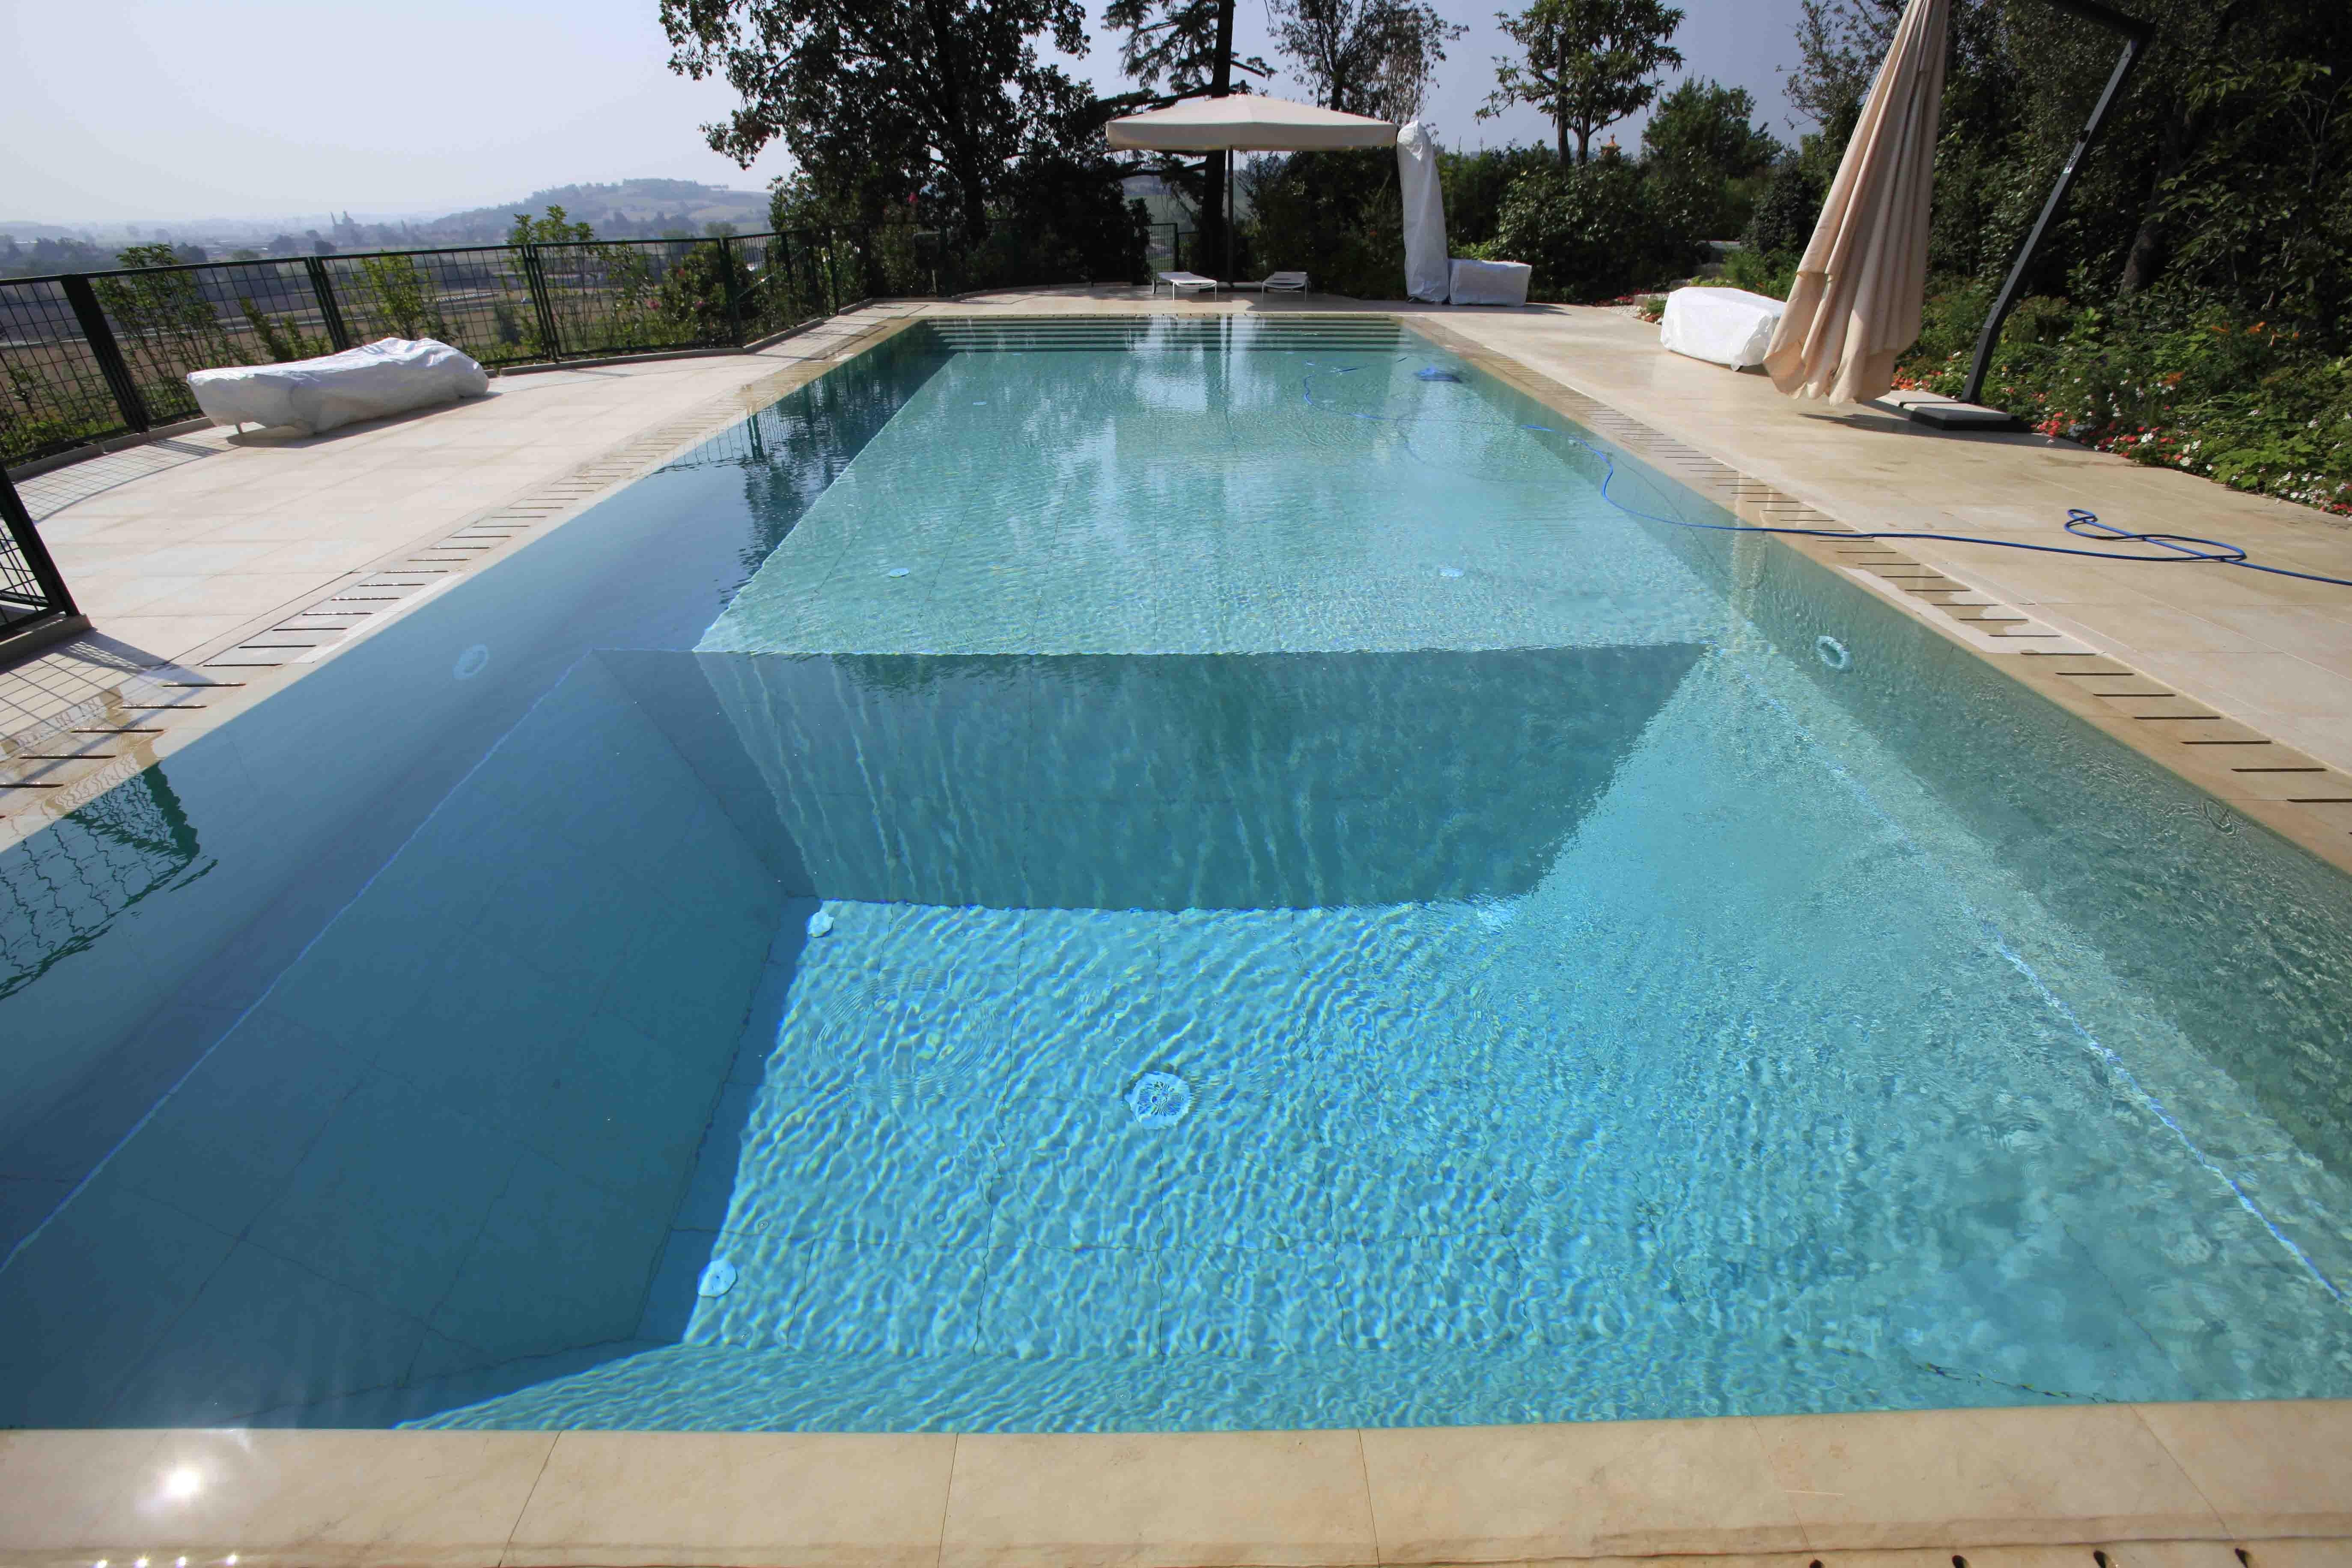 Four dimensions pool - حمامات السباحة